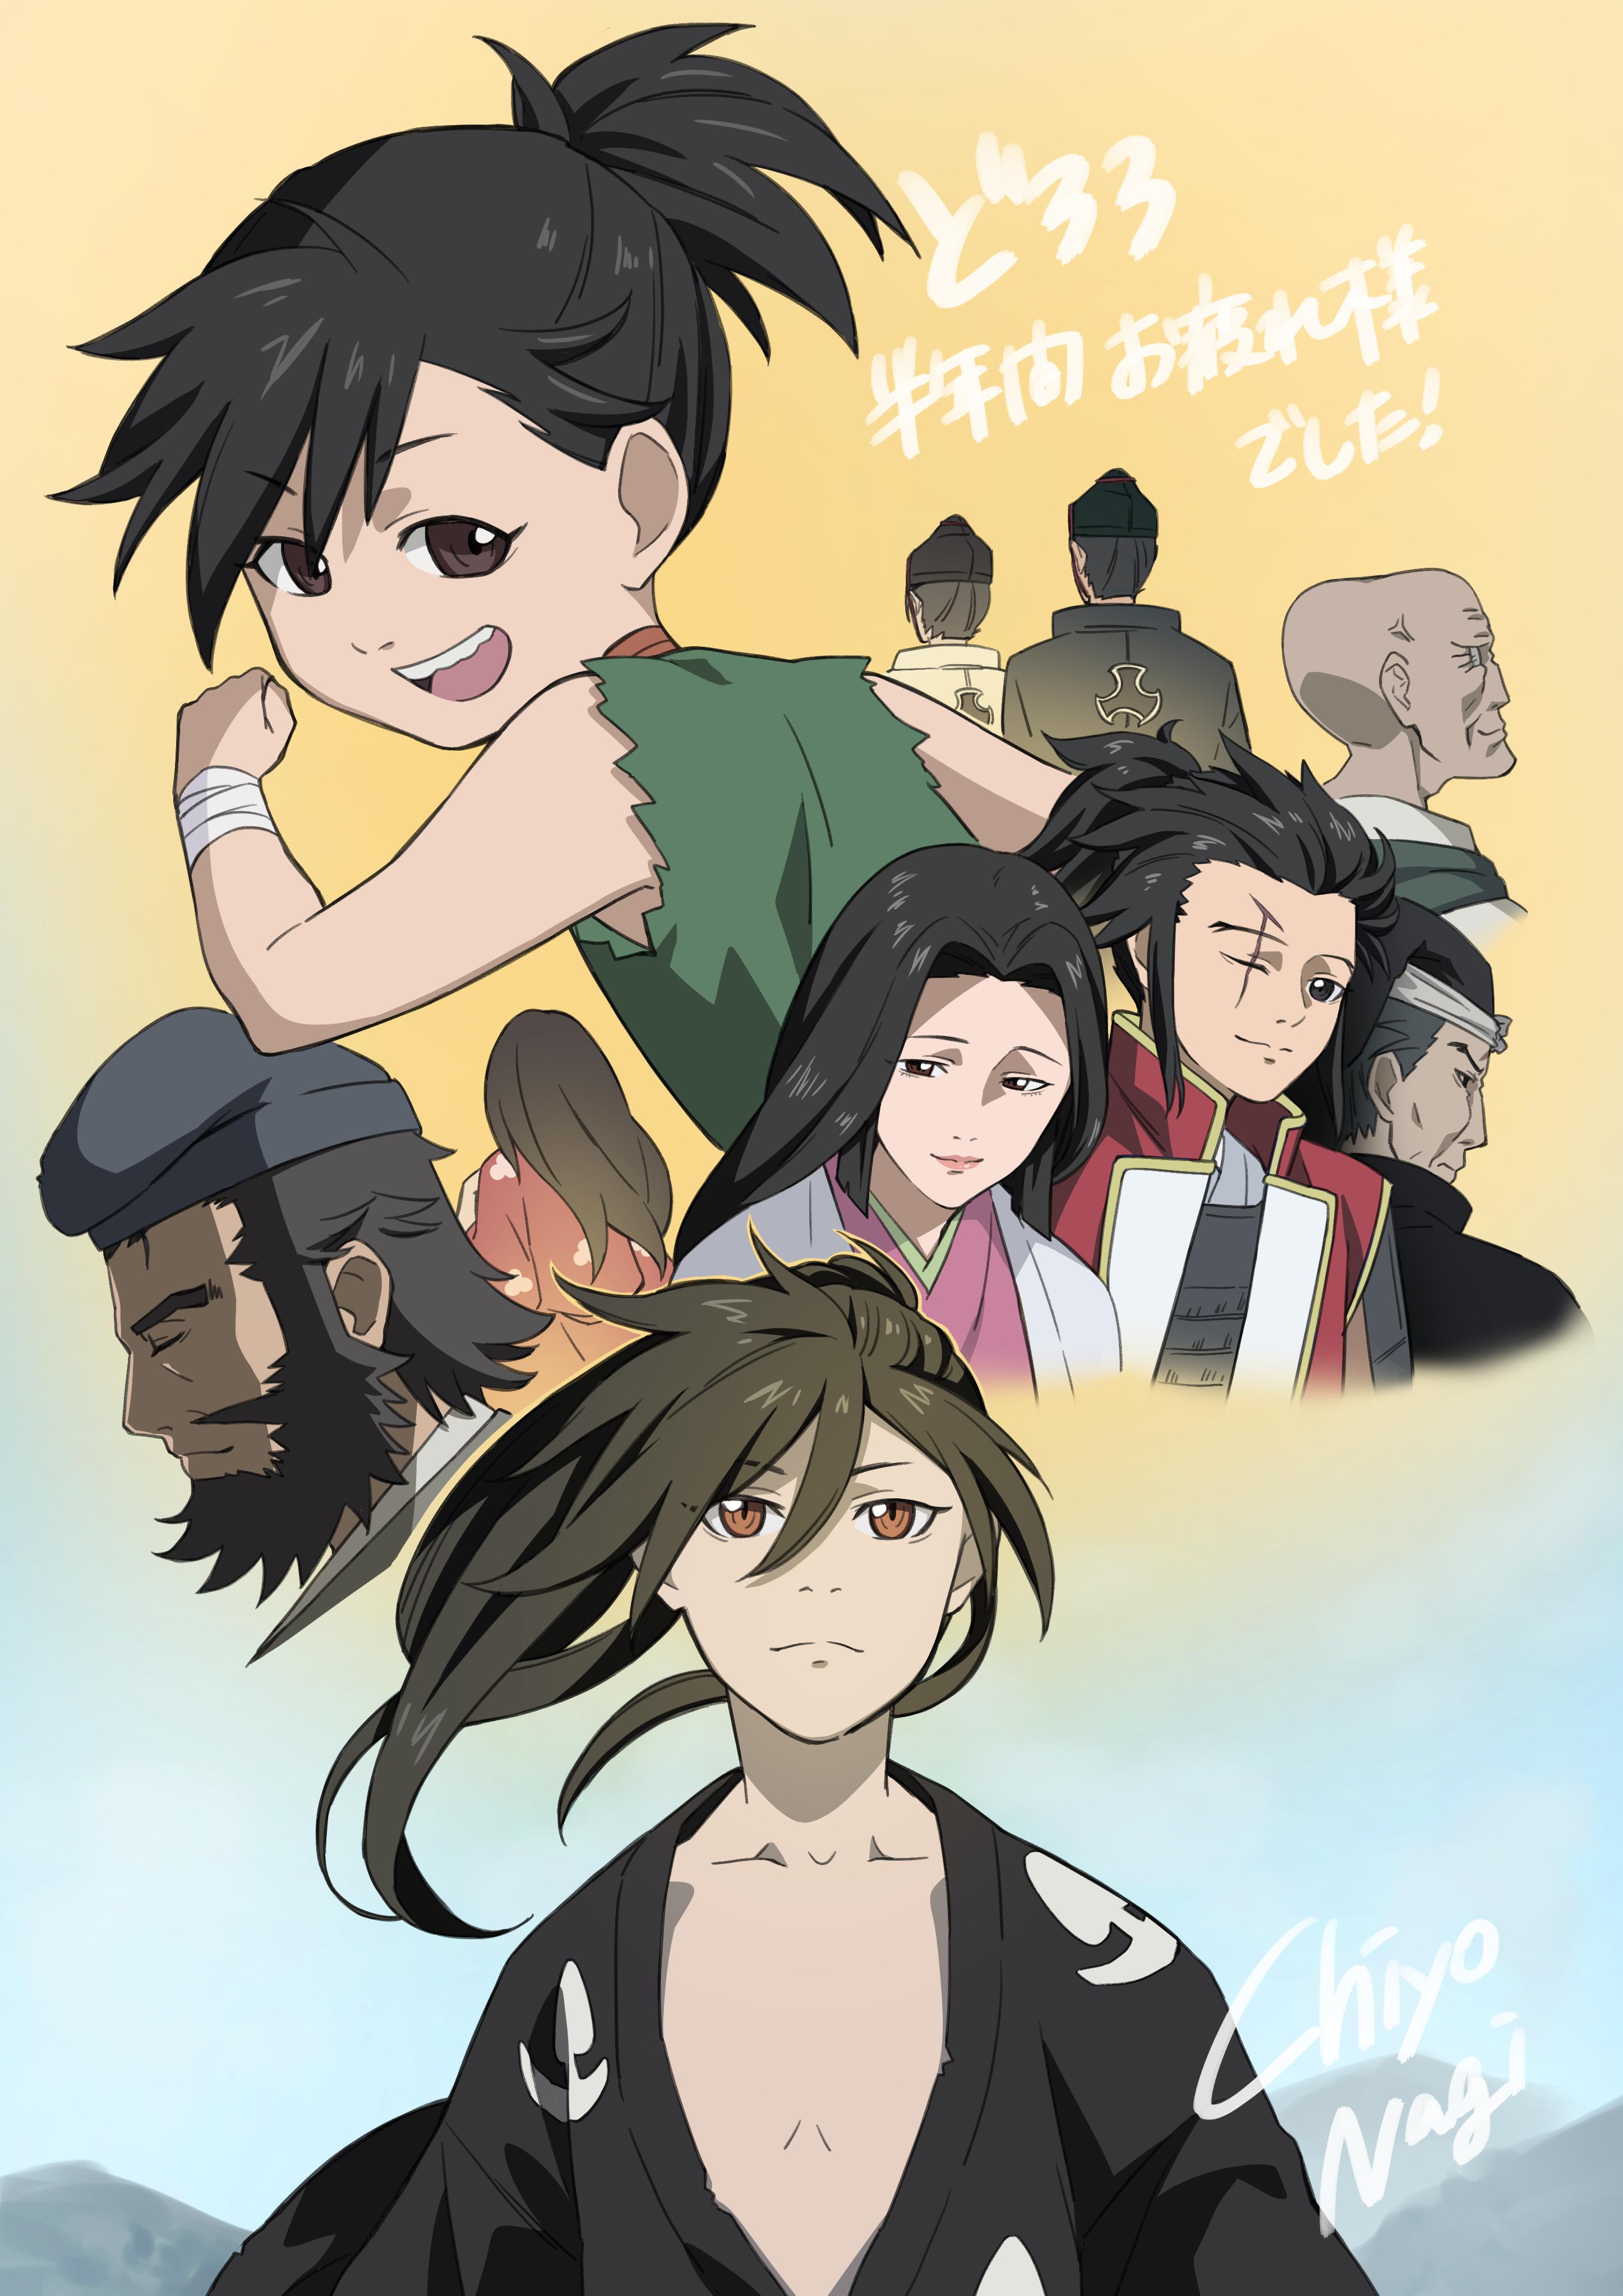 Dororo Anime, Anime images, Anime boy